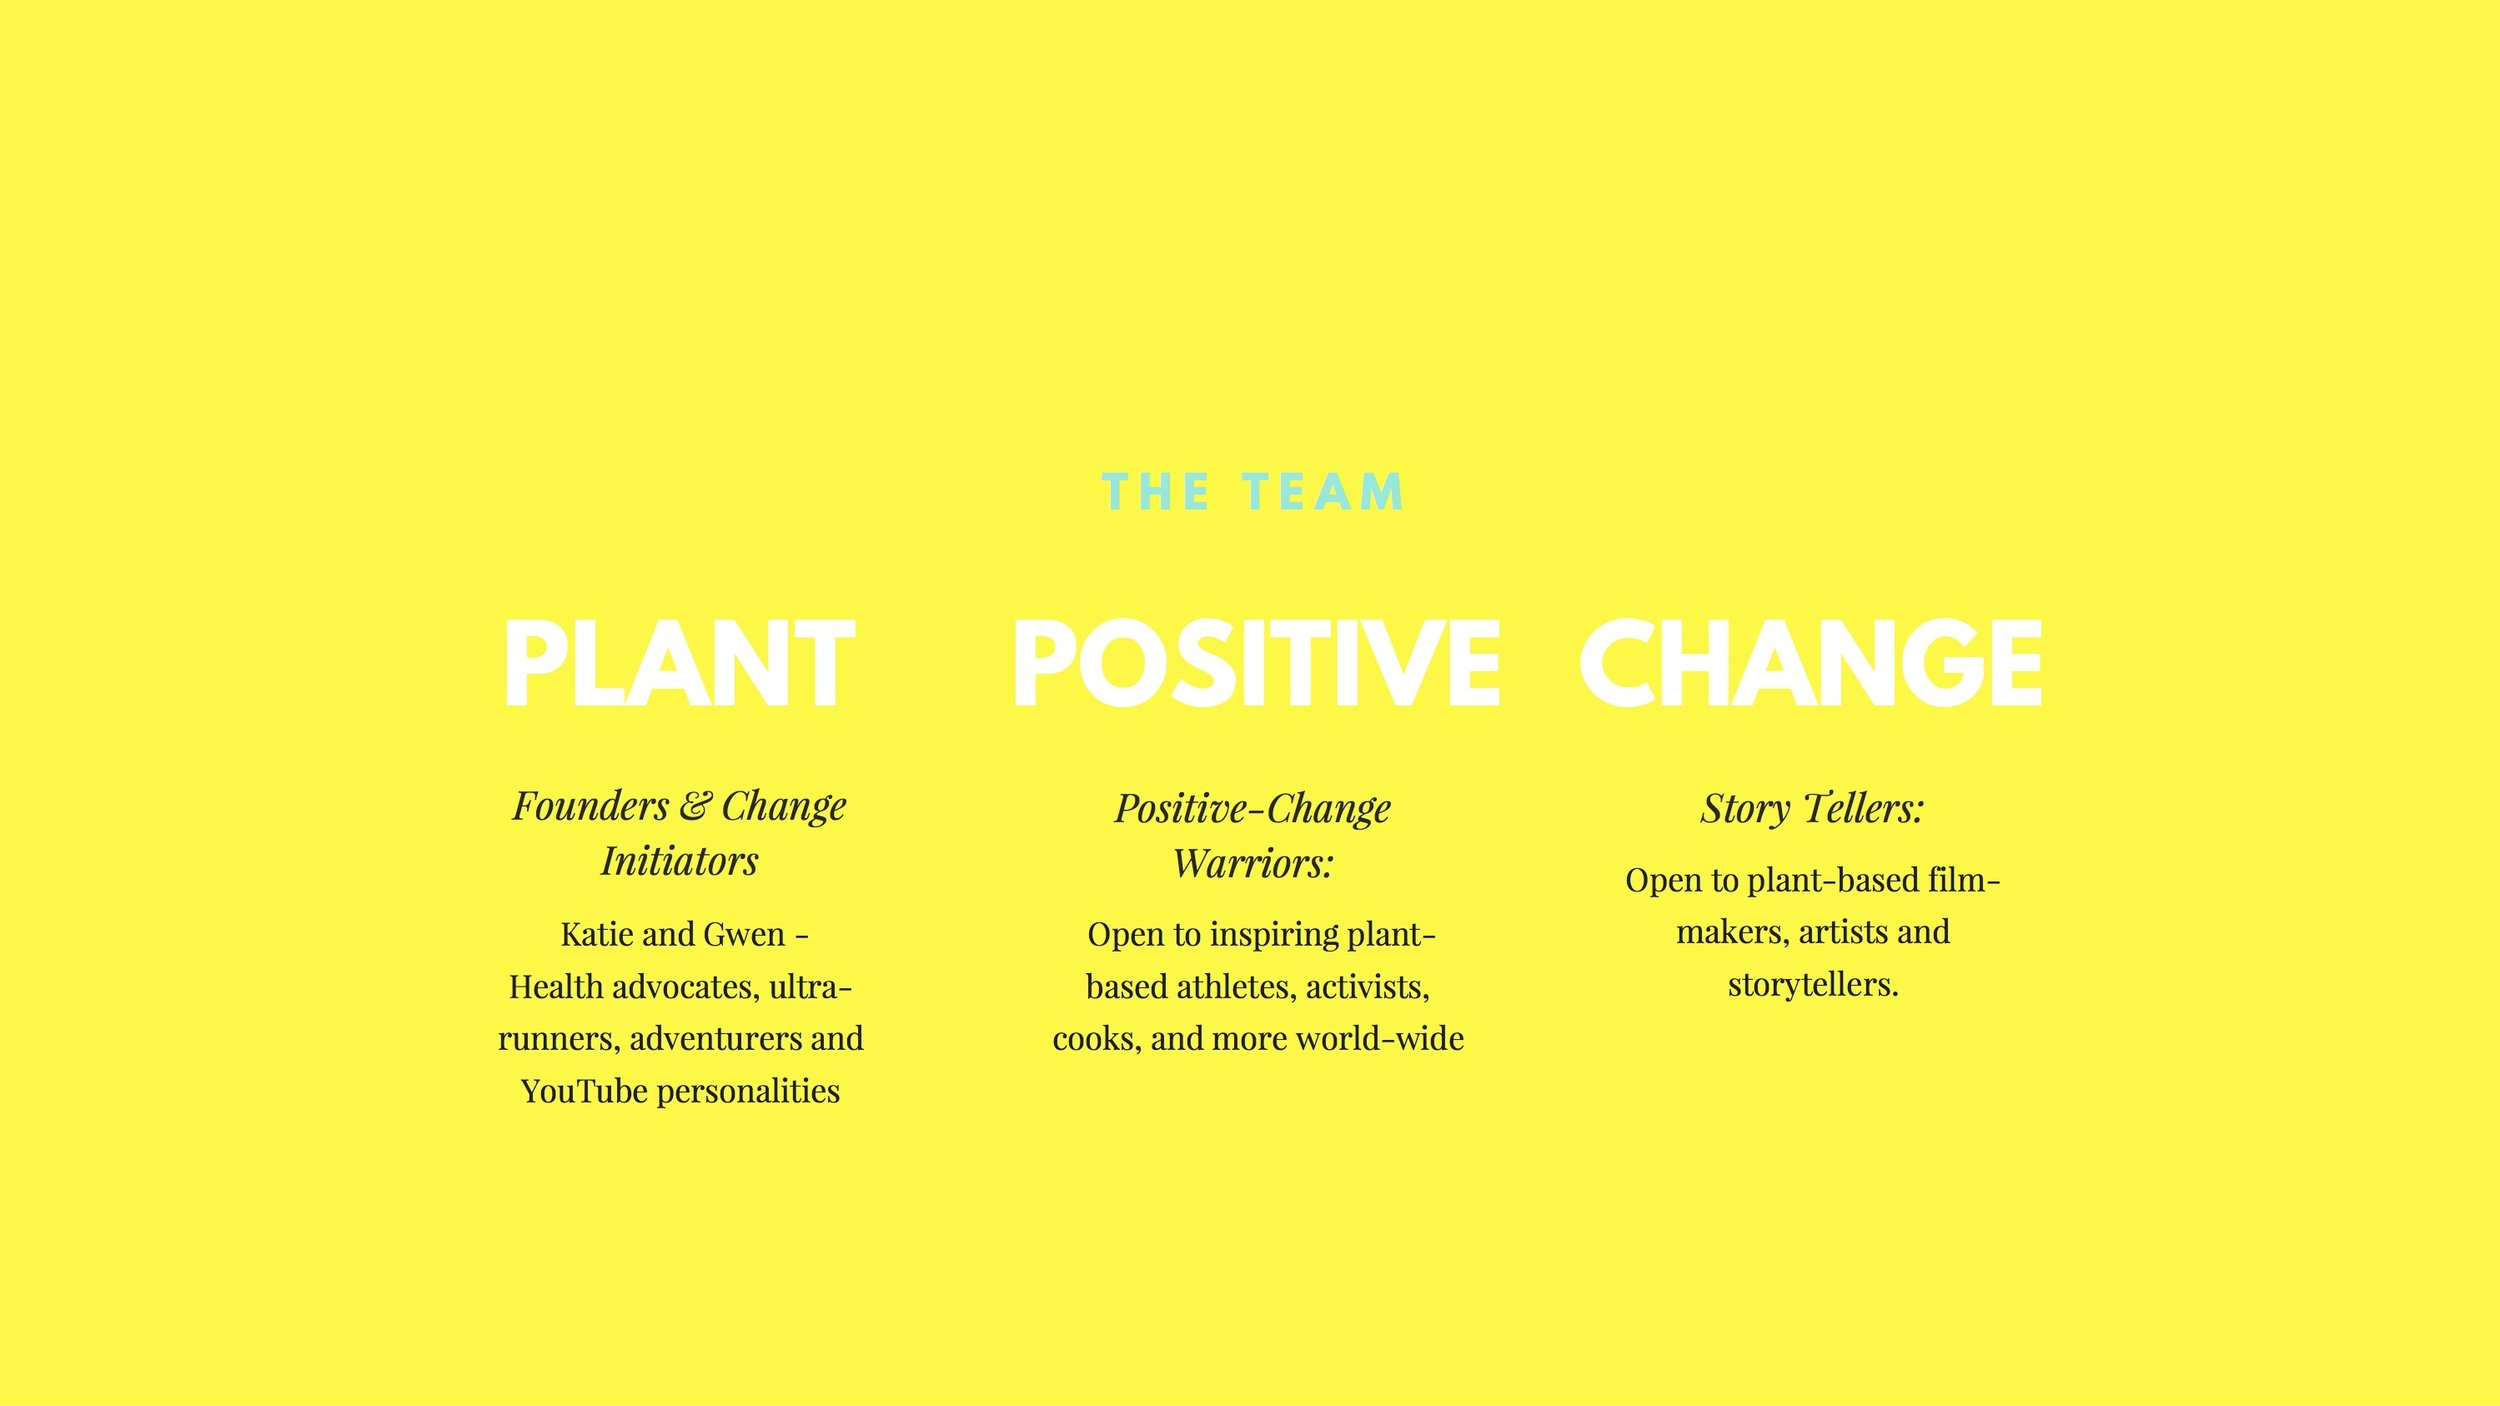 7 Plant Positive Change Foundation.jpg